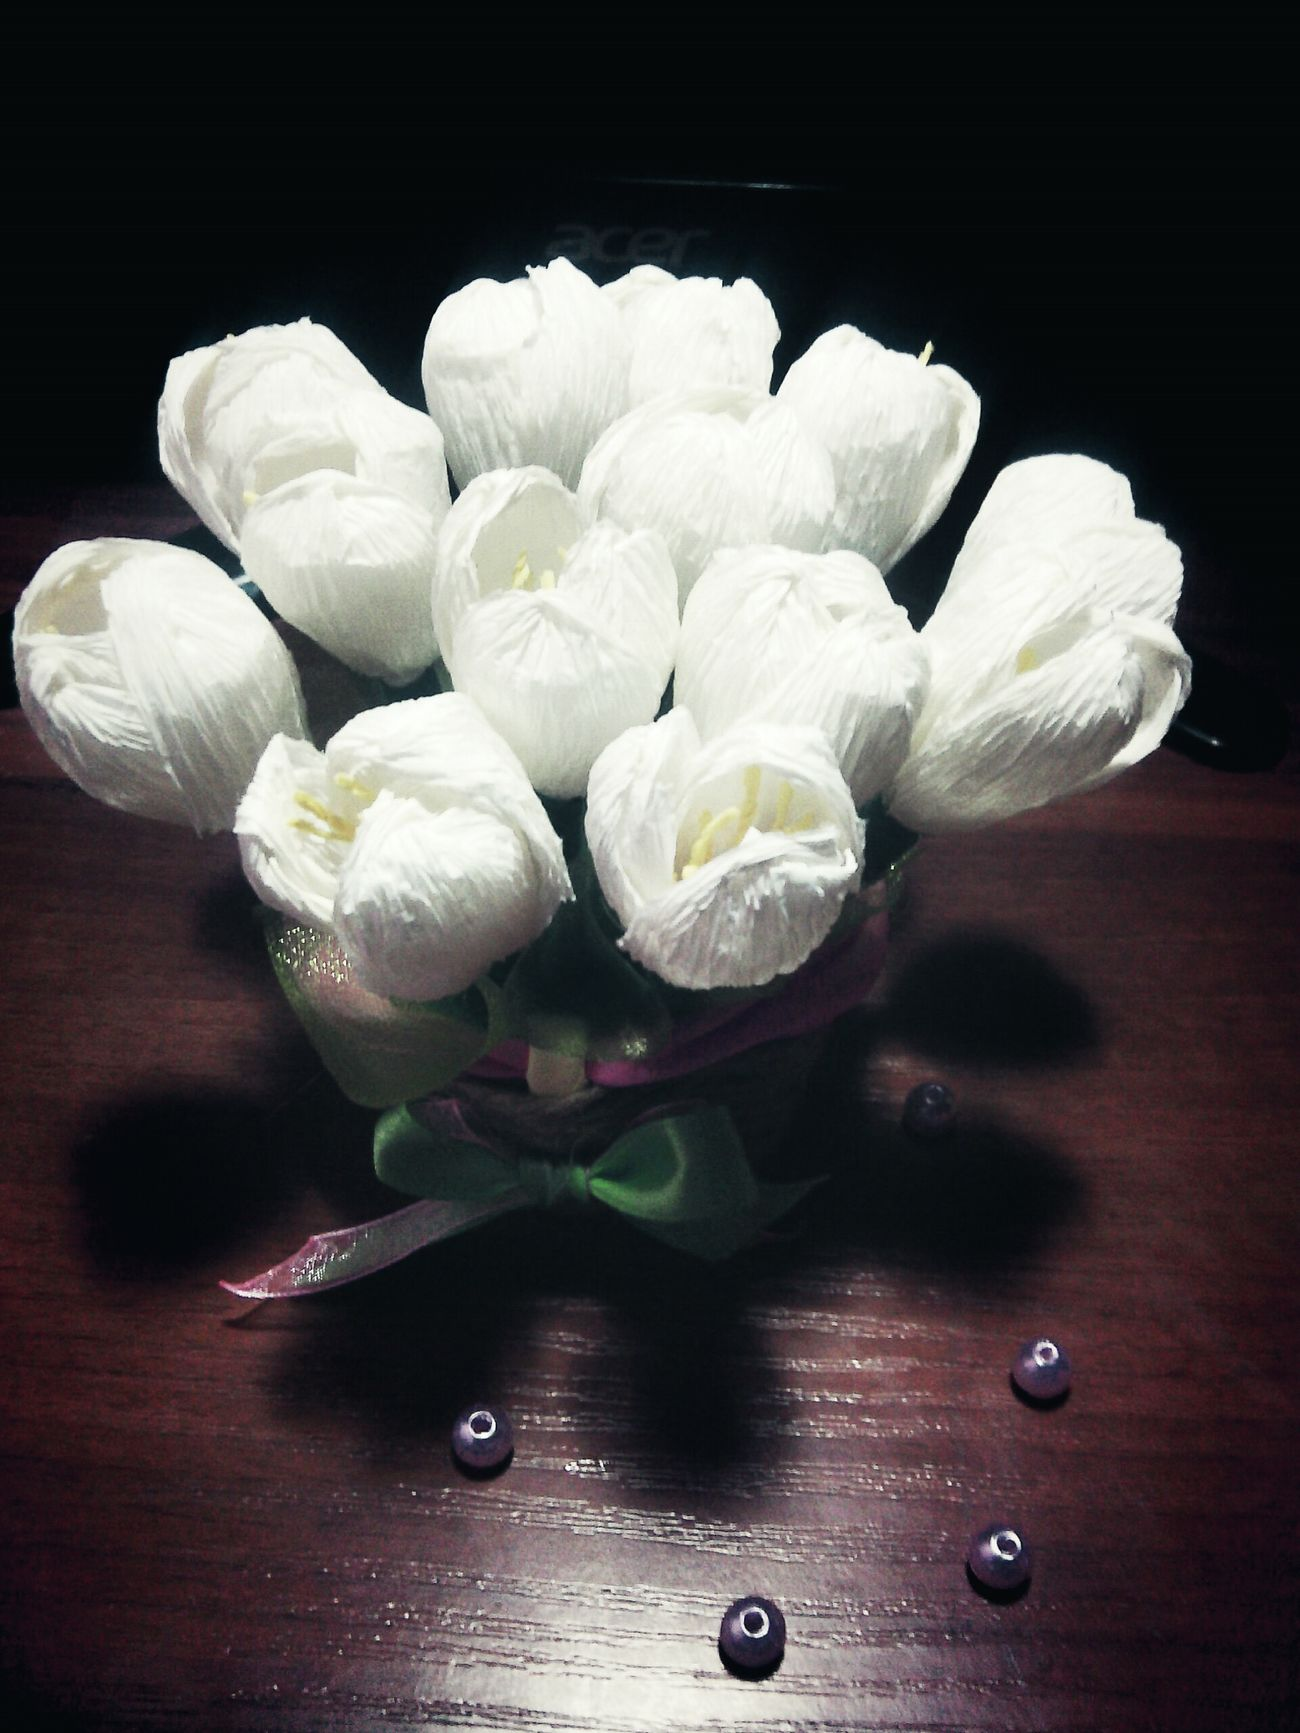 Relaxing крокусы гофрированная бумага ручная_работа весна ♥